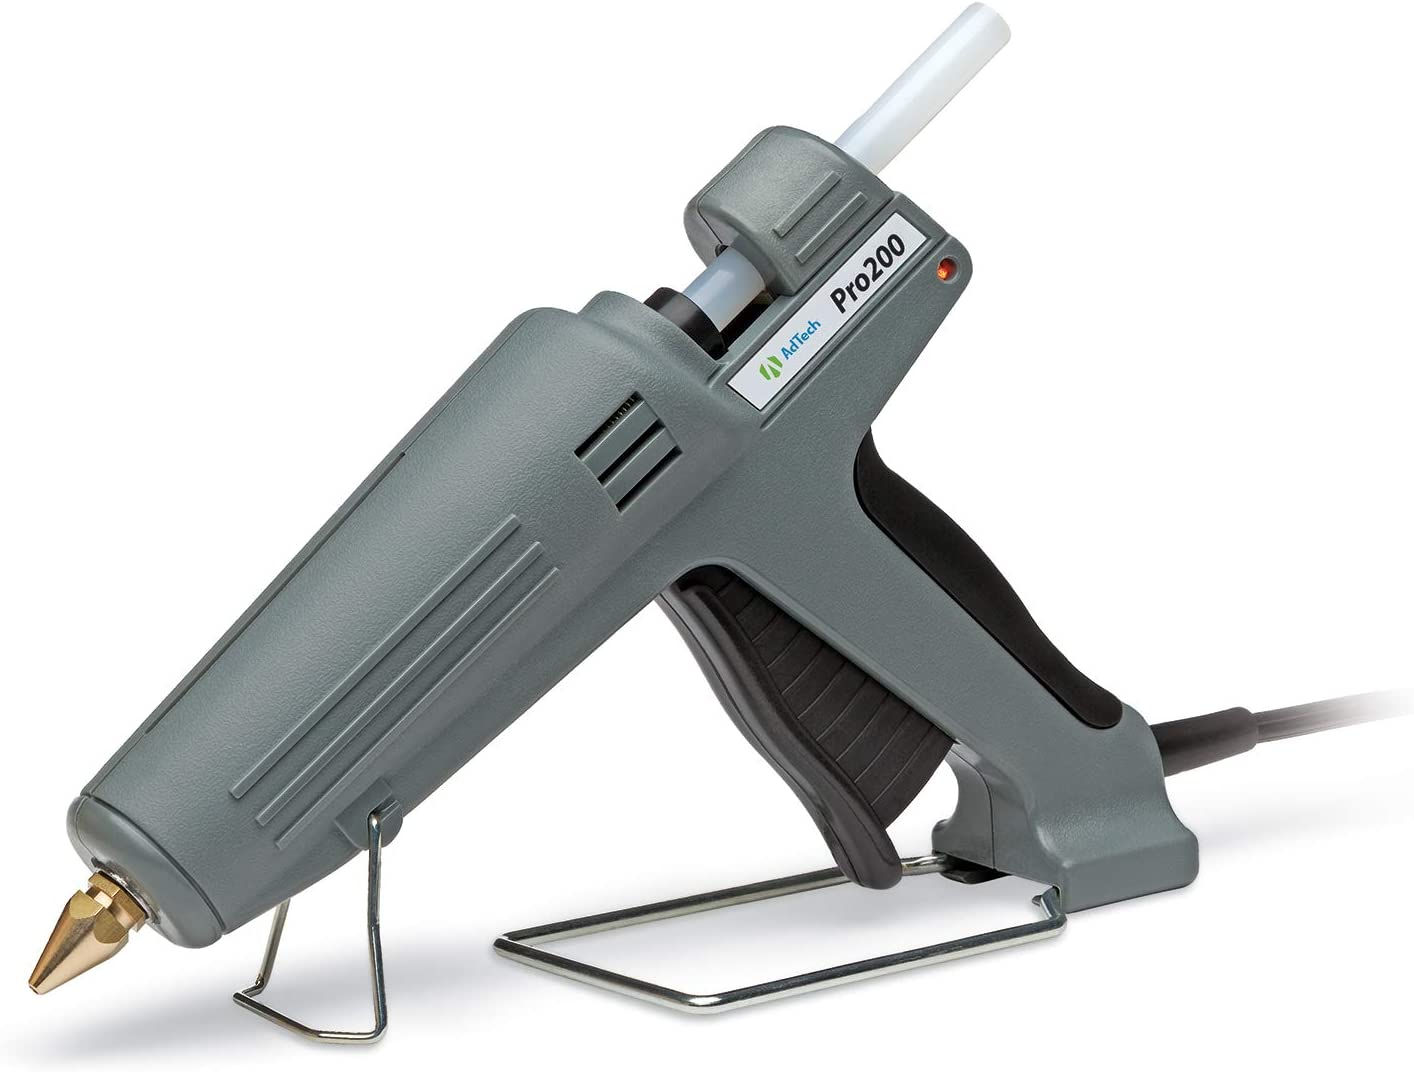 AdTech Pro200 Industrial Strength Full Size High-Output Hot Melt Glue Gun (0189) – Professional Grade Hot Glue Gun for Carpentry, Repairs & Remodeling - Power Glue Guns -